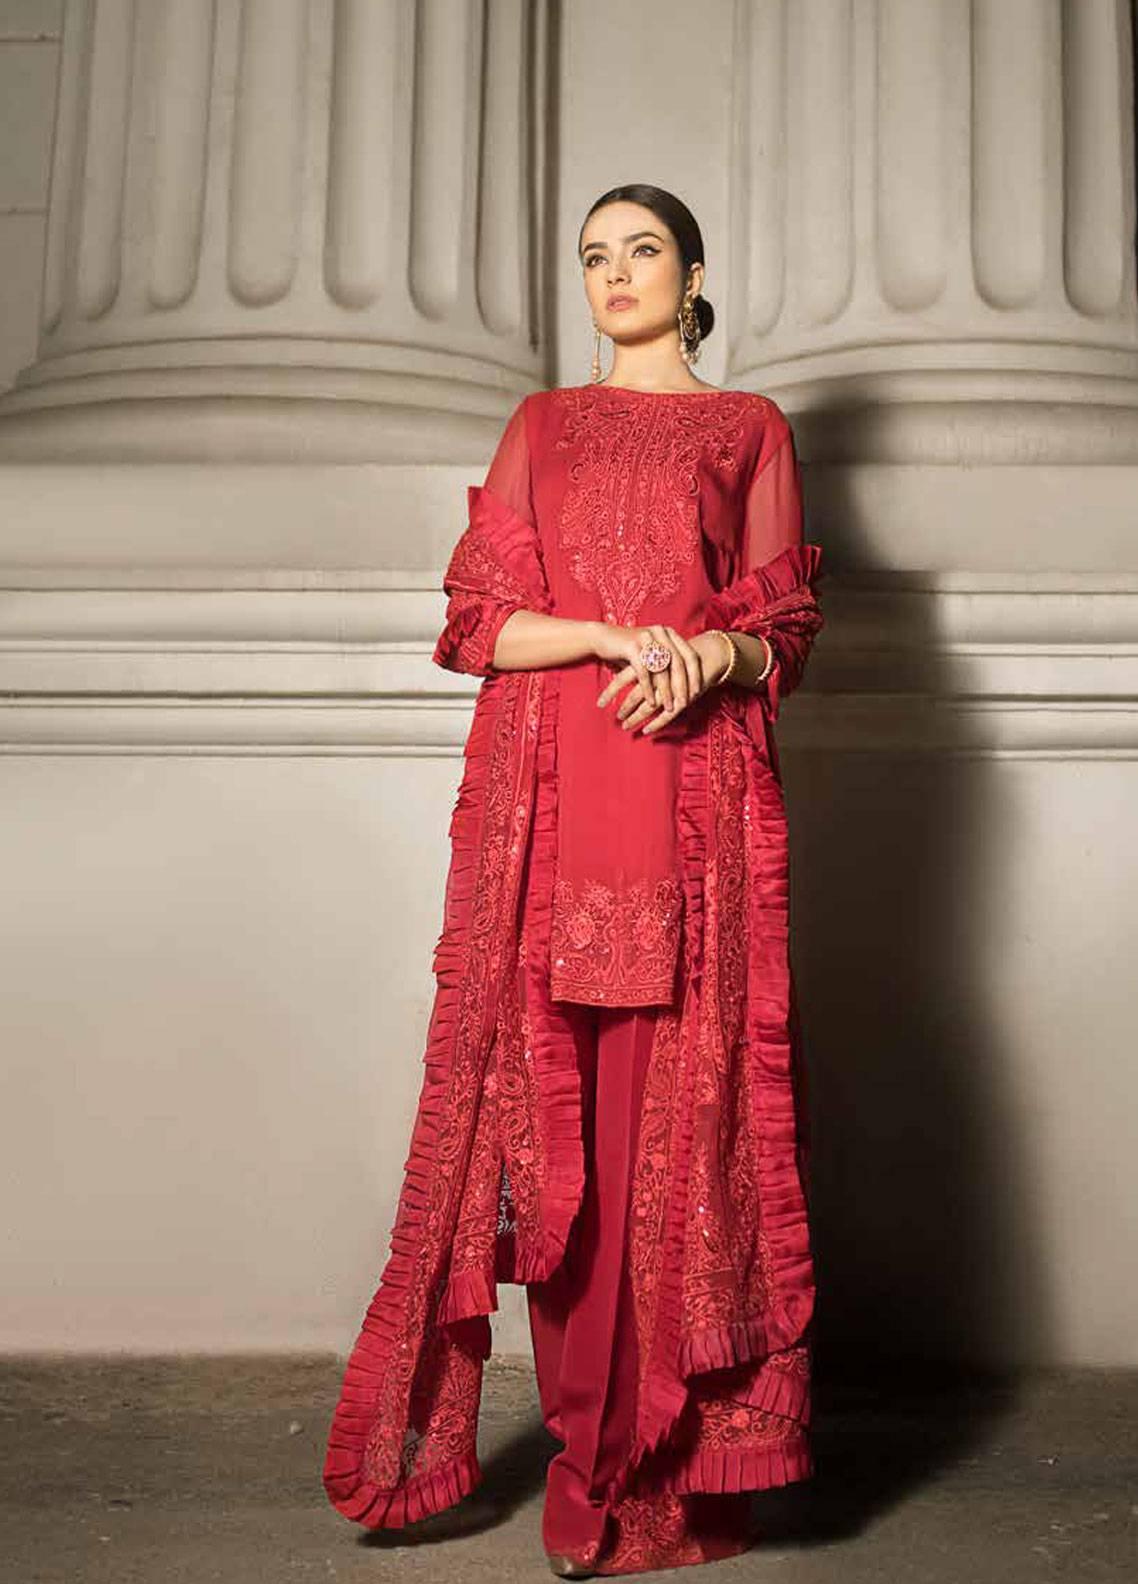 f57d477f9f Honey Waqar By ZS Textile Embroidered Chiffon Unstitched 3 Piece Suit  HWC19EC 09 Roi De Paisly